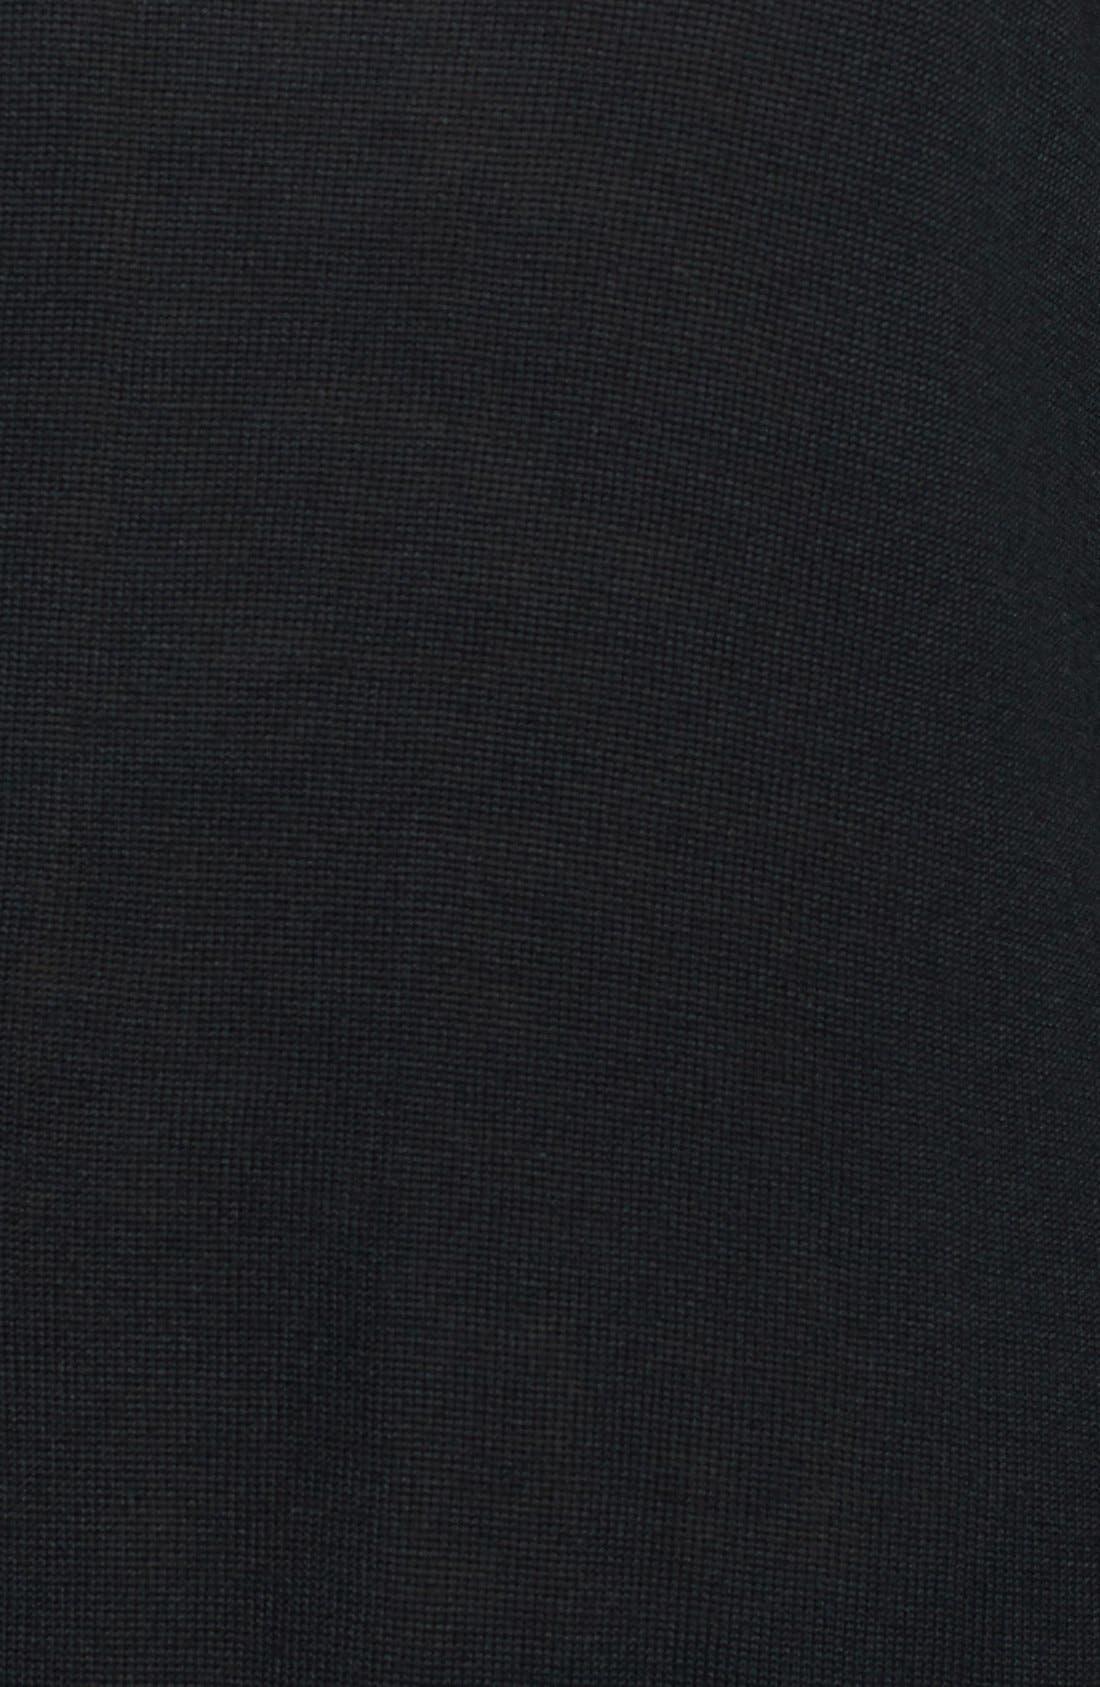 Alternate Image 3  - rag & bone/JEAN Open Knit Sleeve Pullover